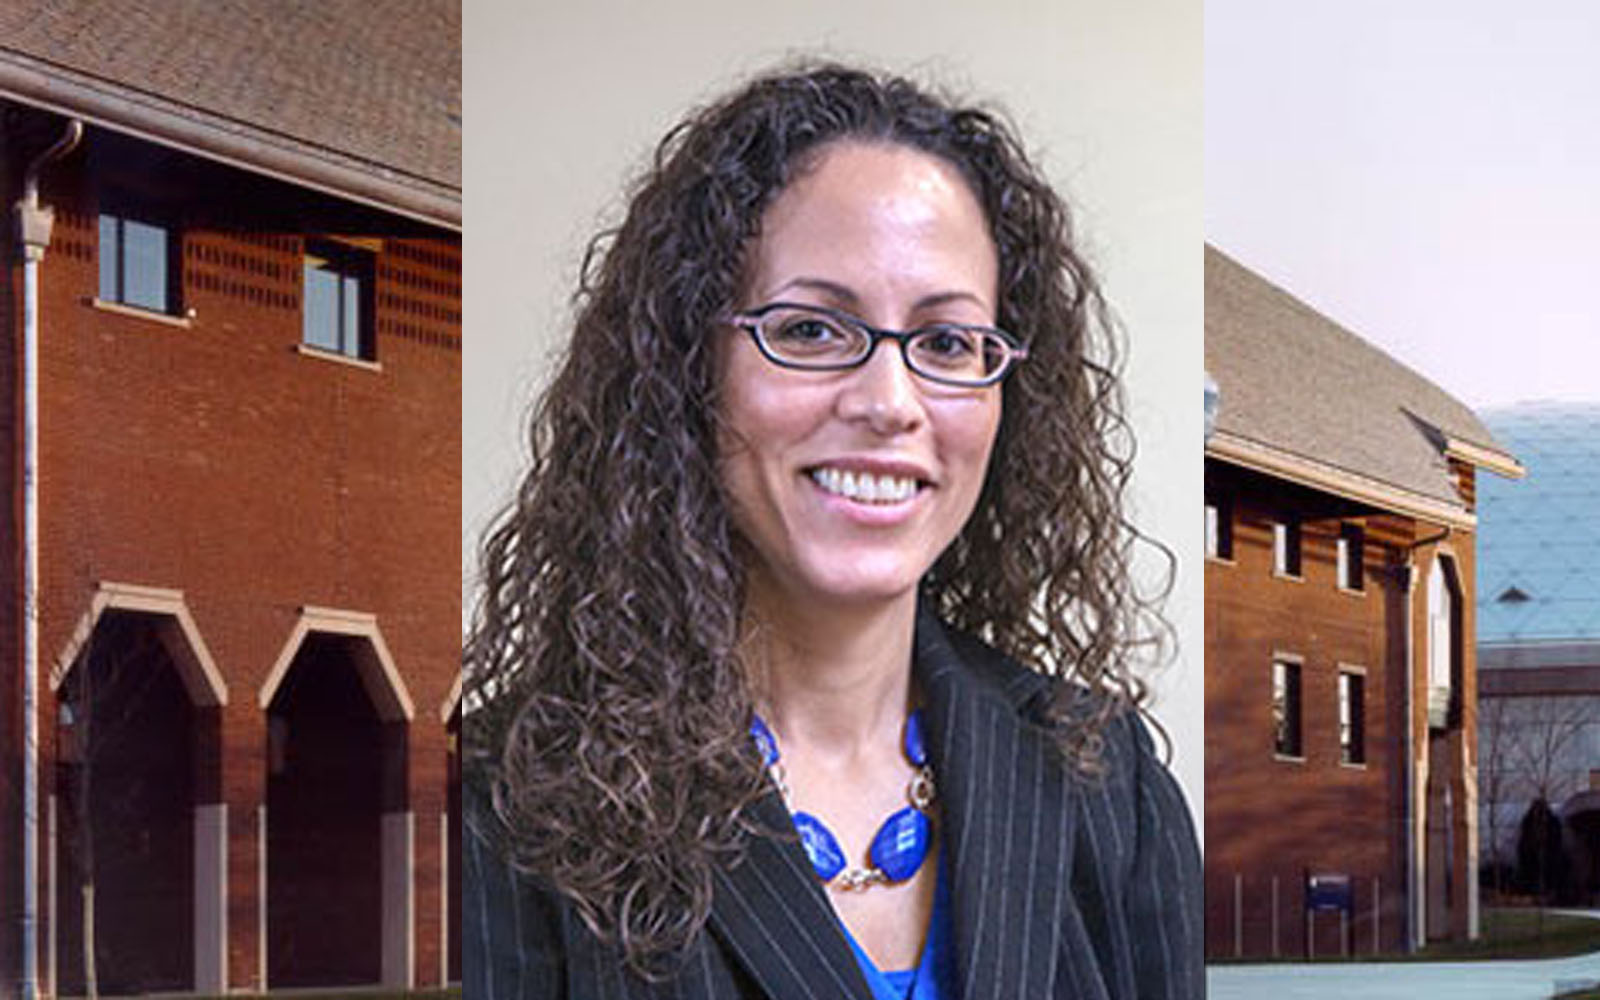 Rowena Ortiz-Walters Becomes One of the Few Hispanic-Americans to Lead a U.S. Business School